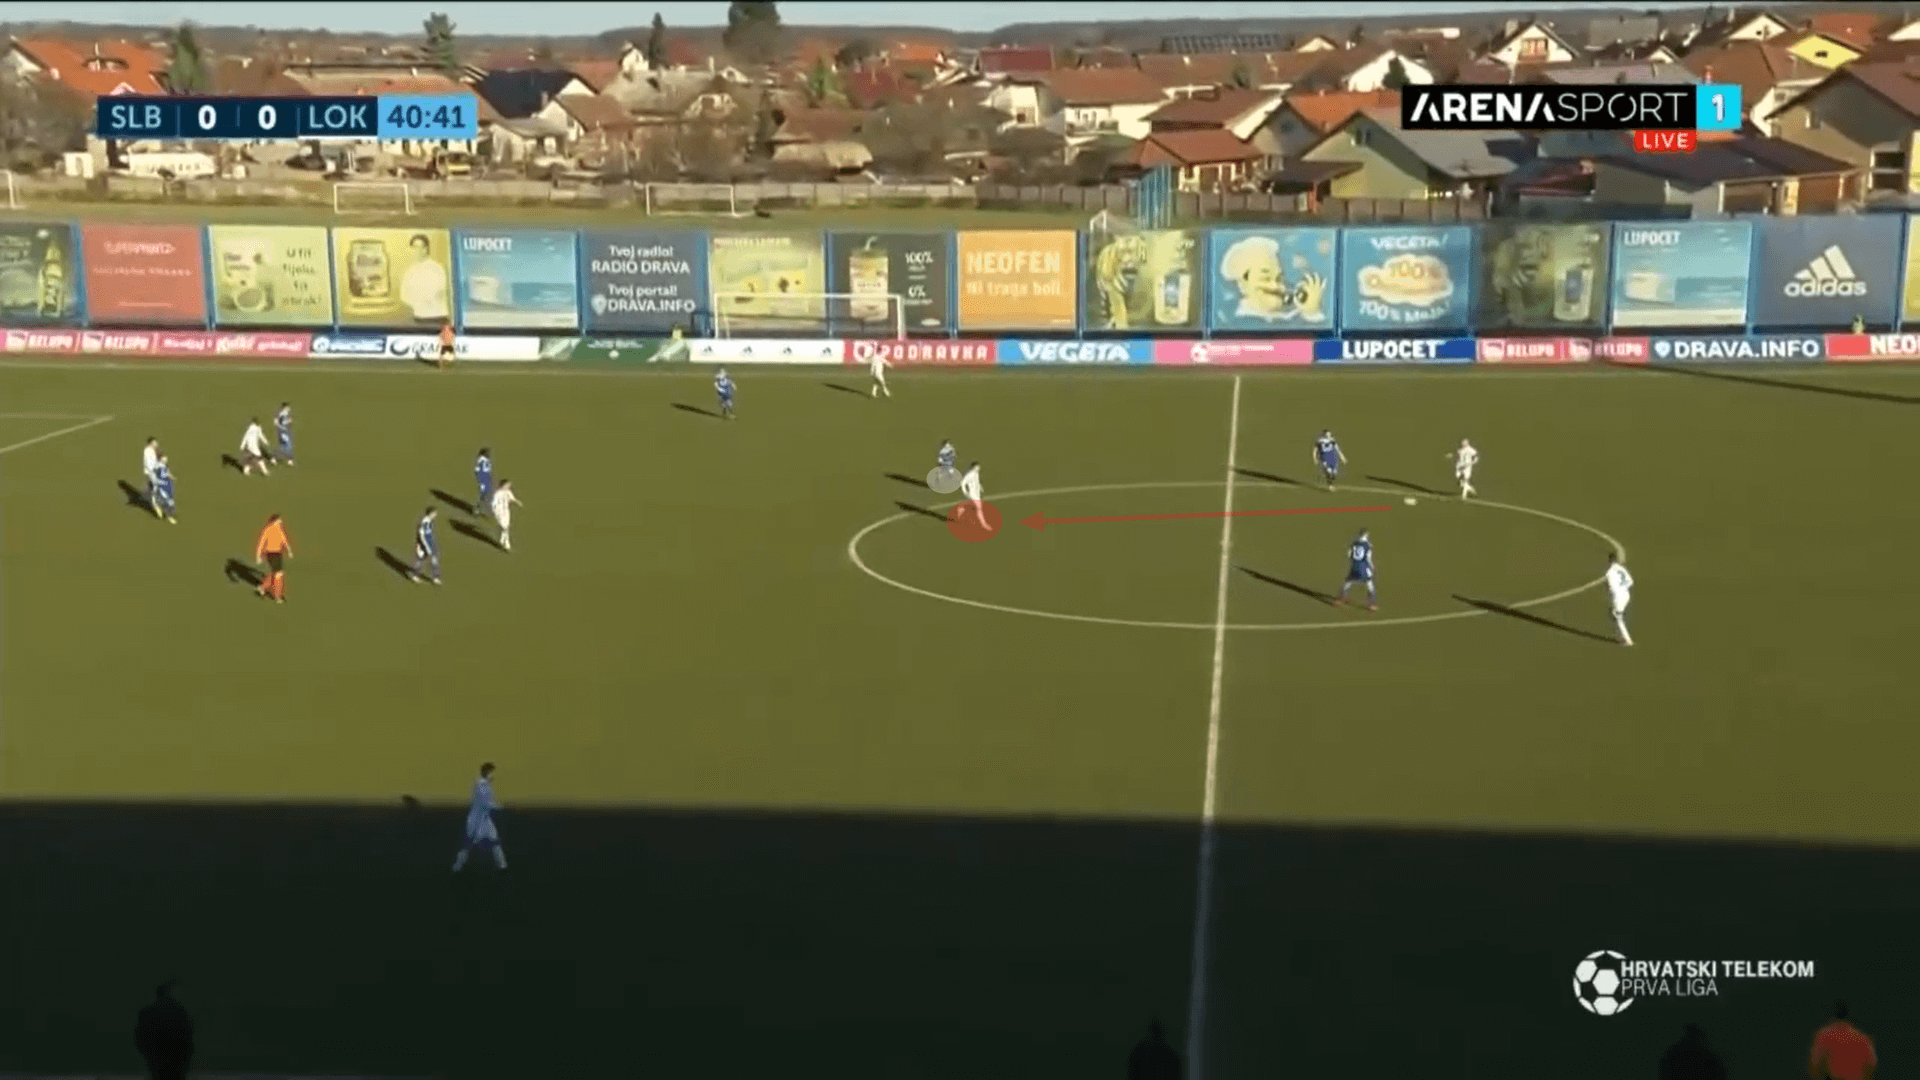 Glavčić in demand: Ex-Partizan hot prospect having a breakout season in Croatia - scout report tactical analysis tactics